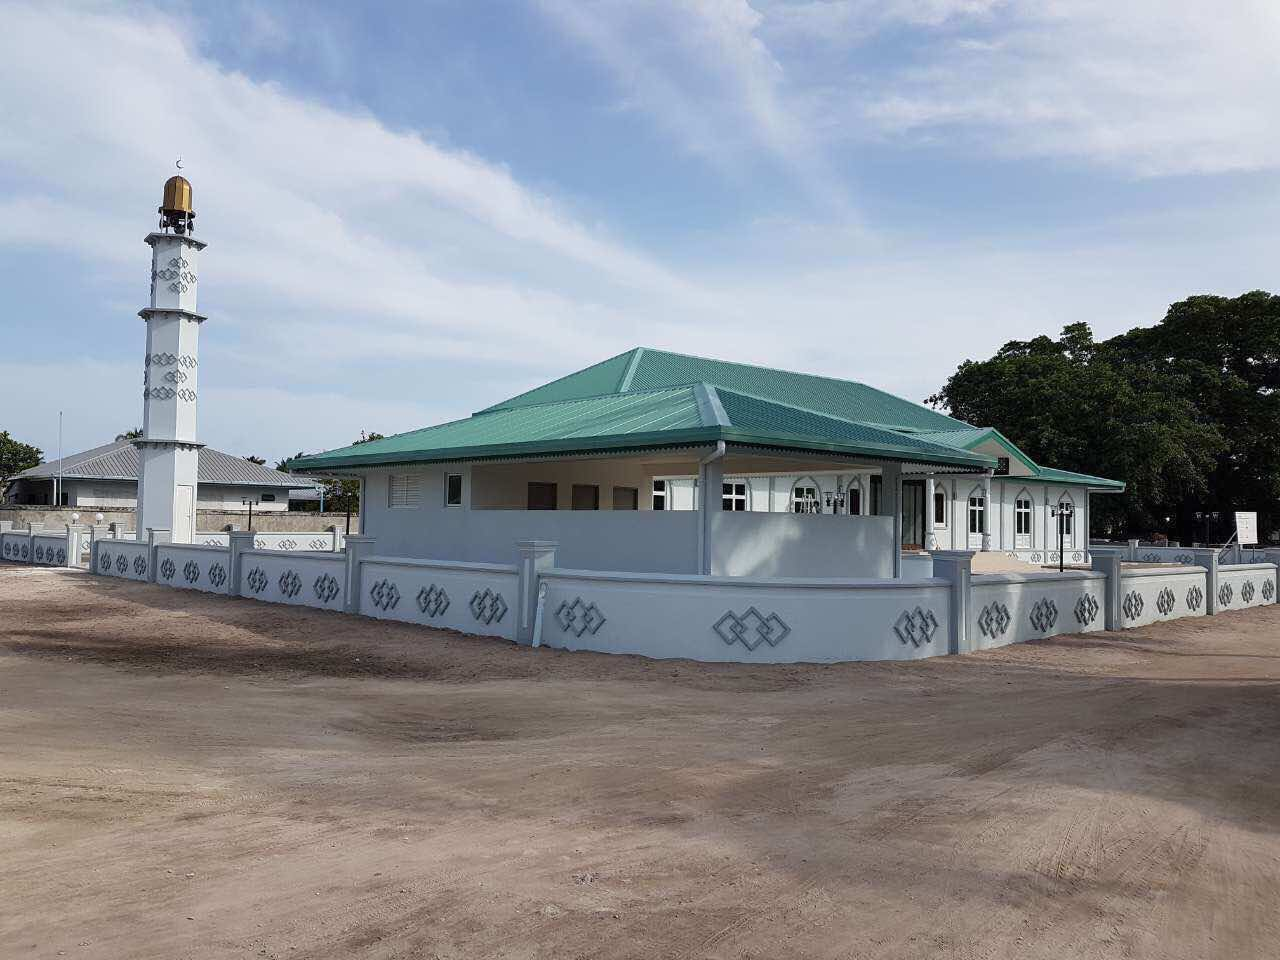 Hanimaadhoo Mosque 9 (16)9